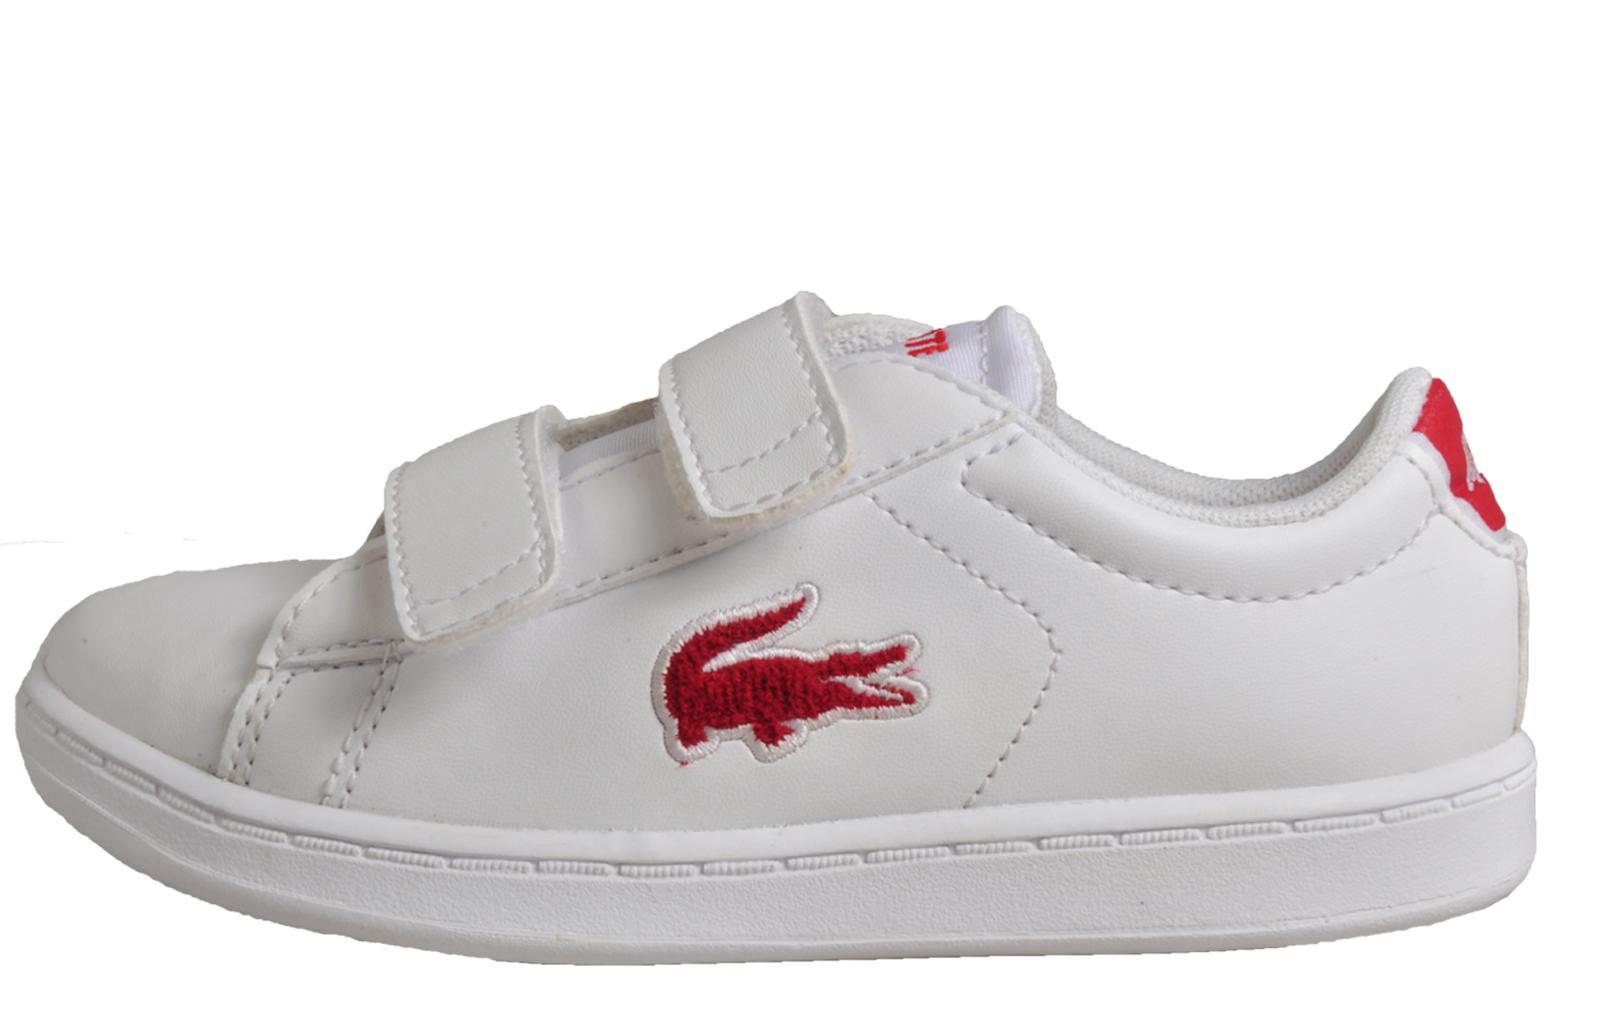 04d2db5d222f3c White   Red. Lacoste Carnaby Evo Infants B Grade - LA171843B. alternate  view 2